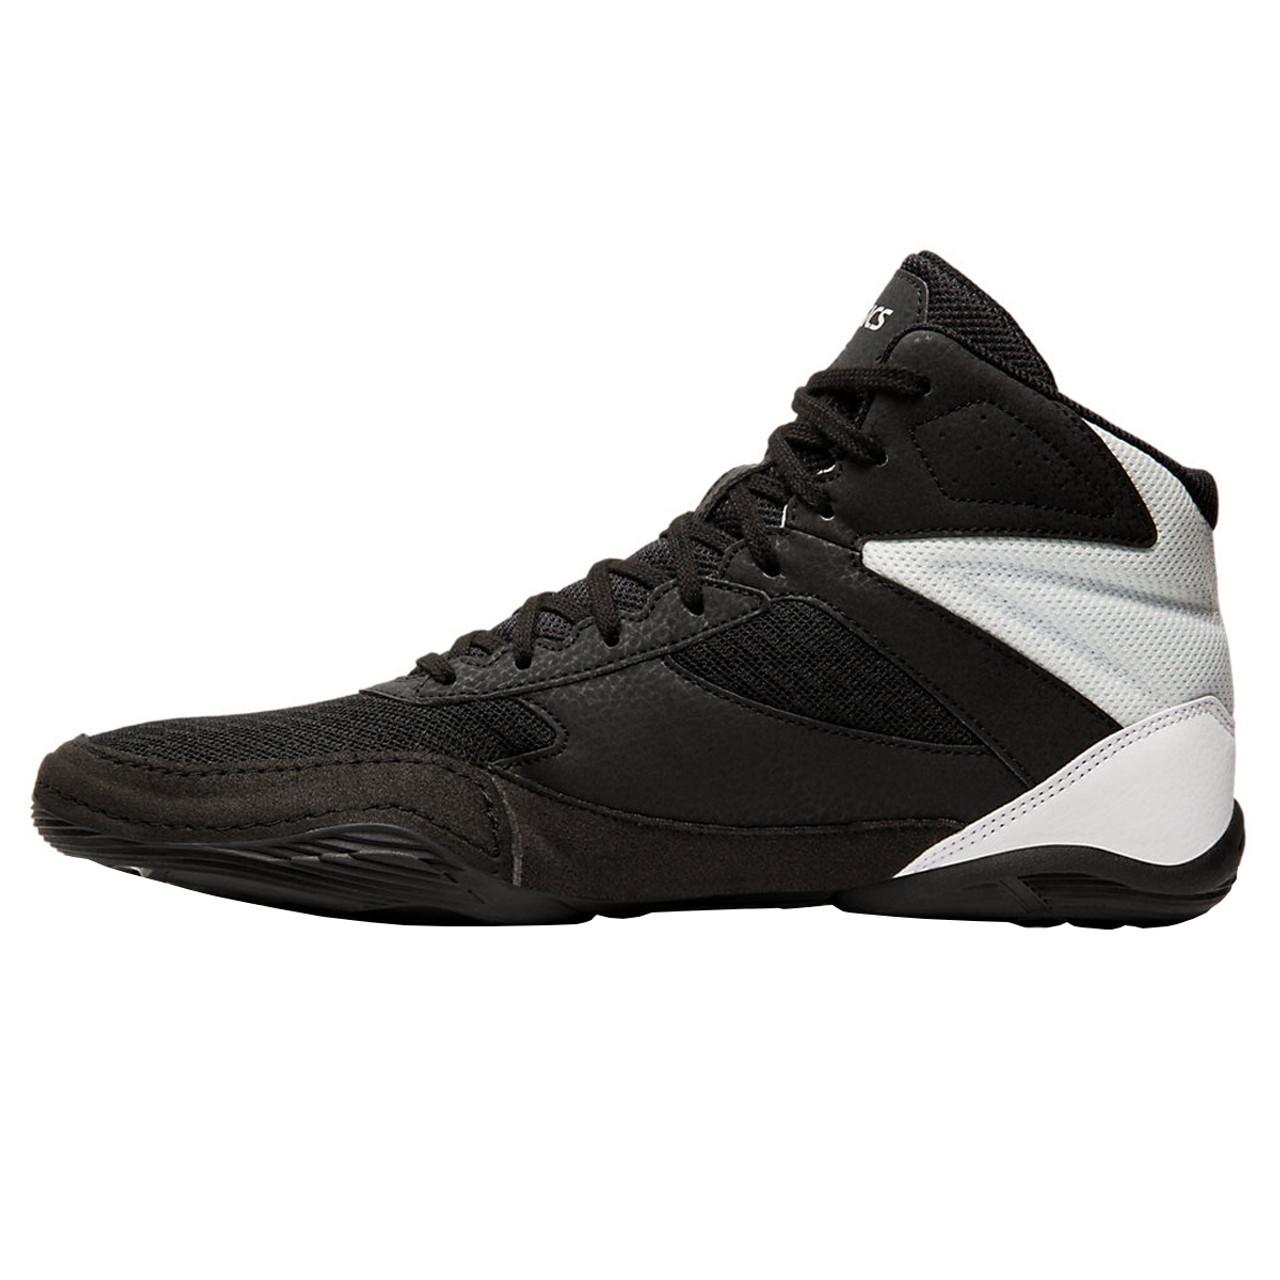 ee1b1e99 Asics Matflex 6 Adult Wrestling Shoes - Black, Silver